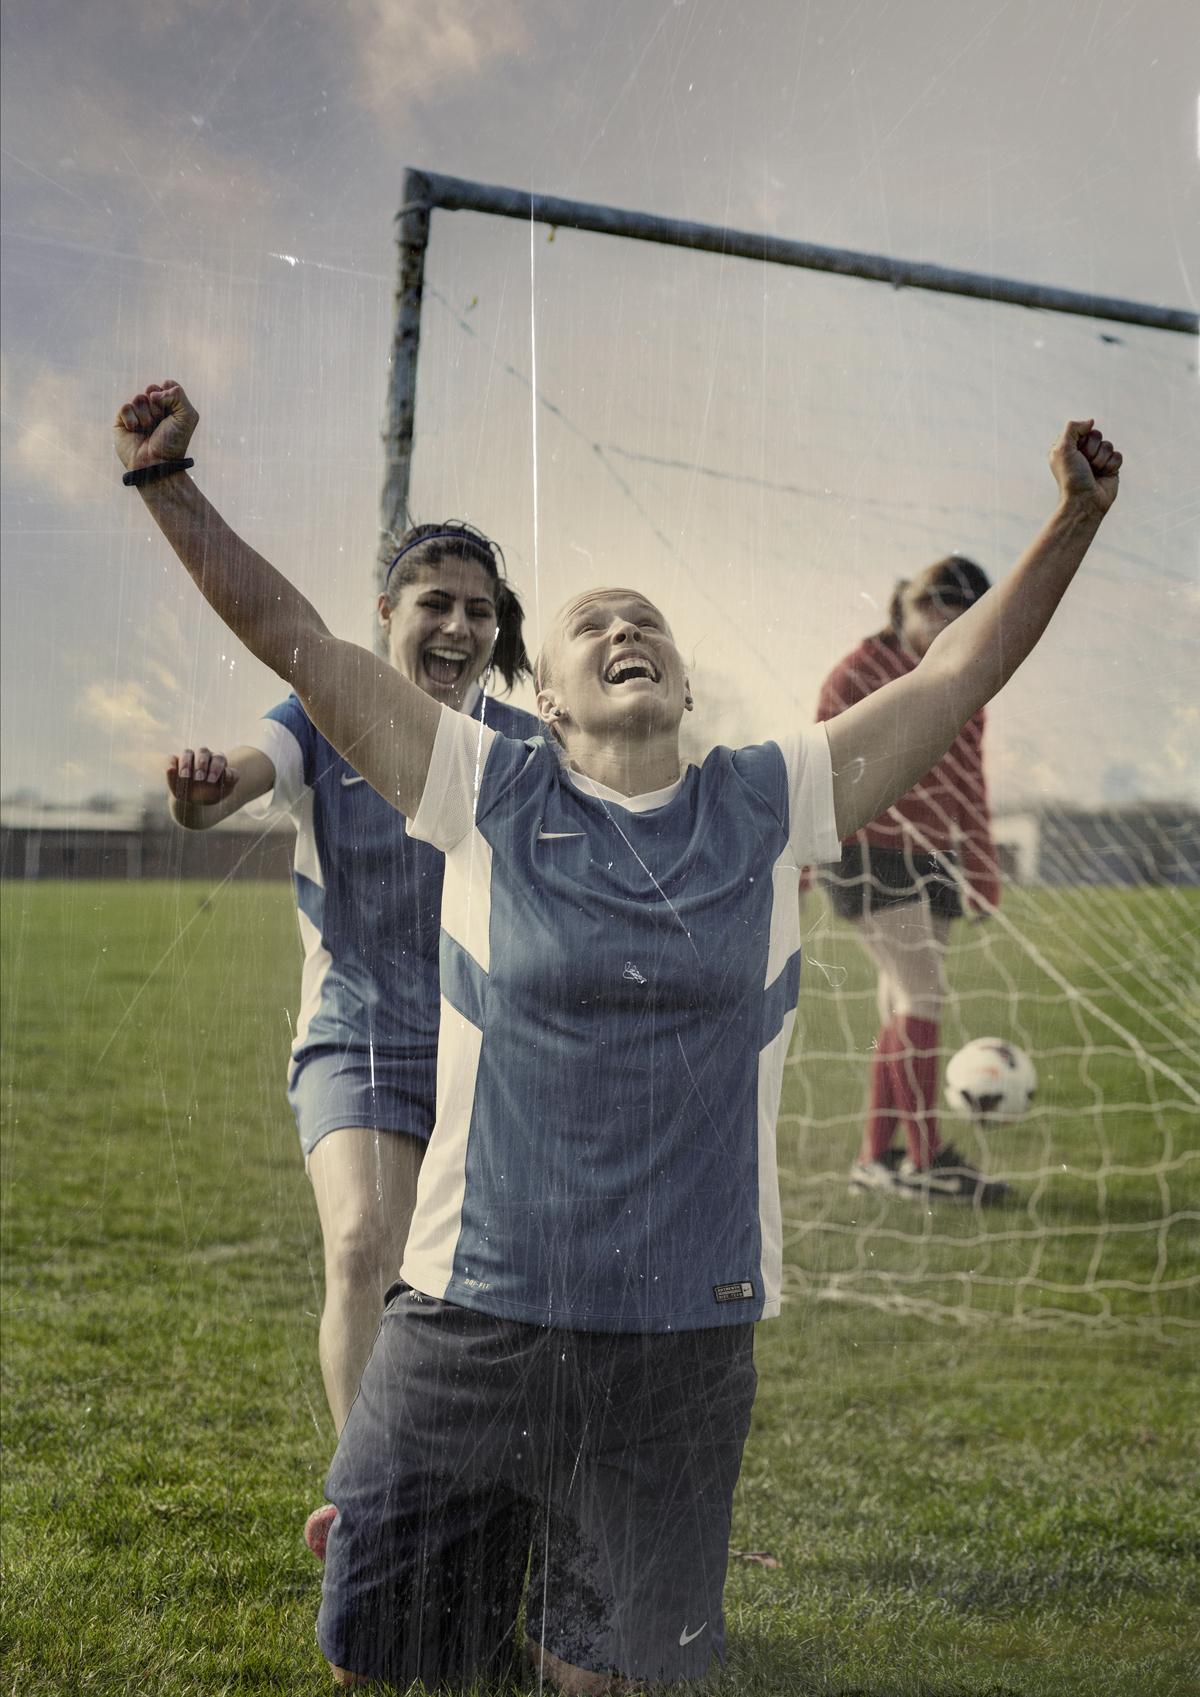 RanaldMackechnie.The FA. 'Love Football. Play Football1%22.jpg